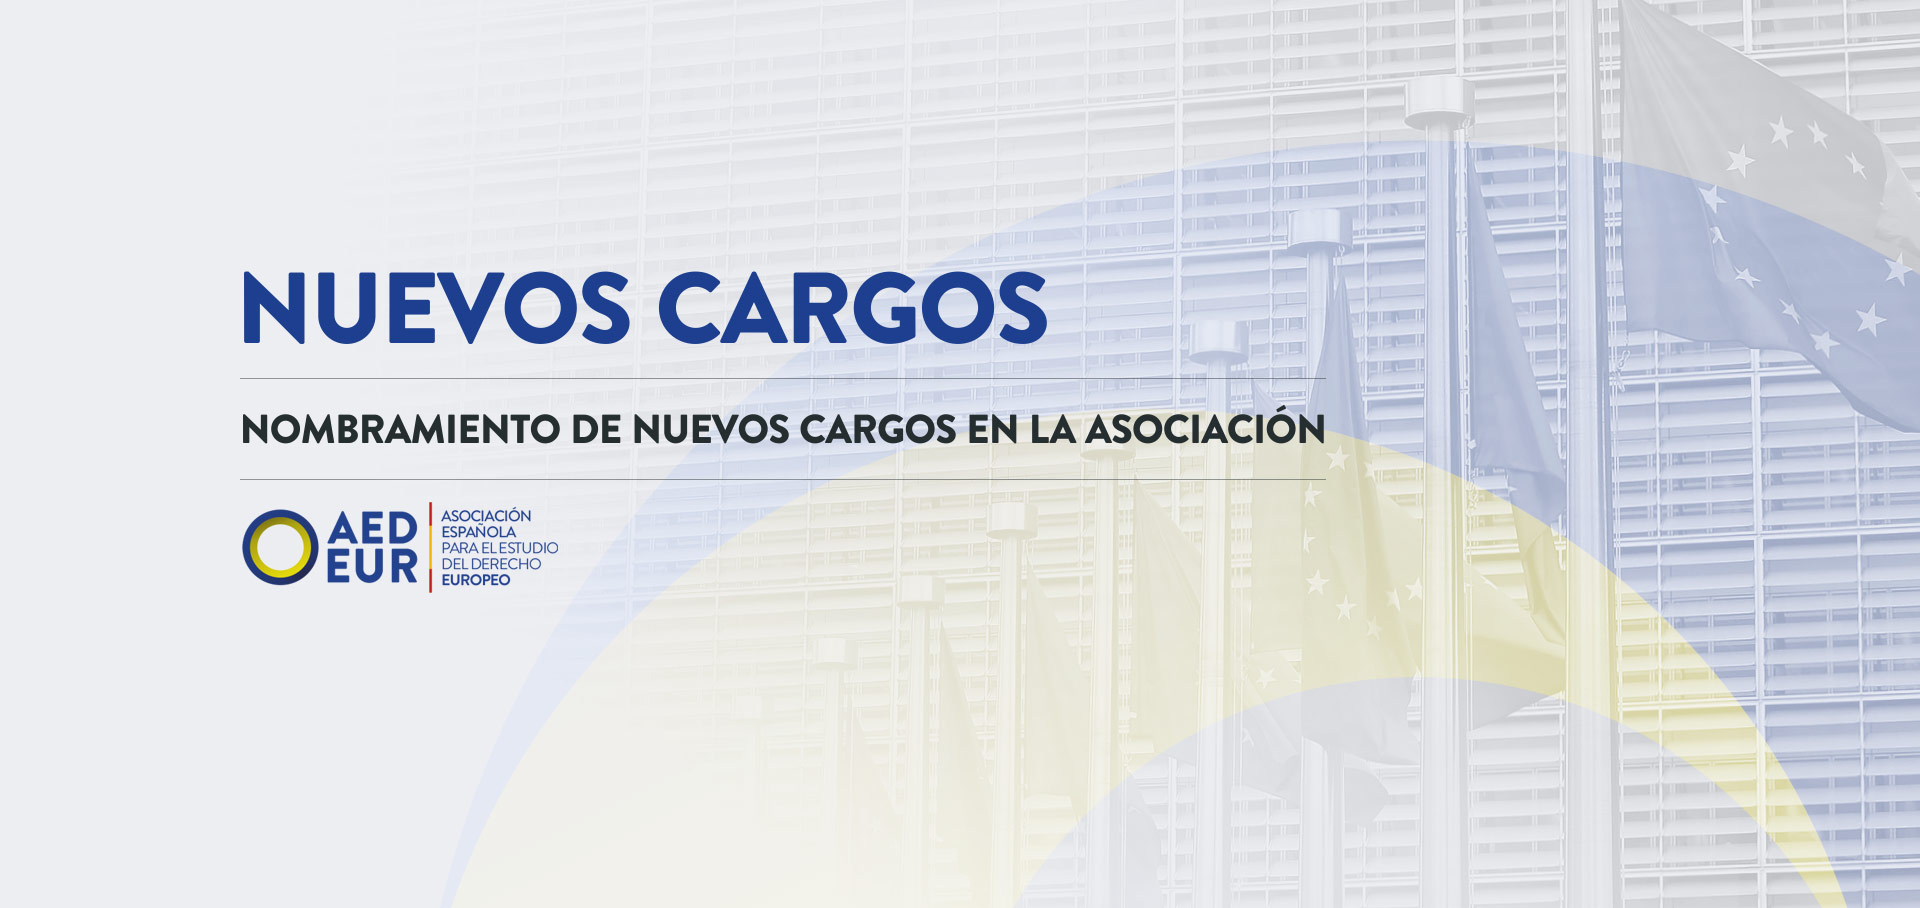 z_intro-02-Cargos